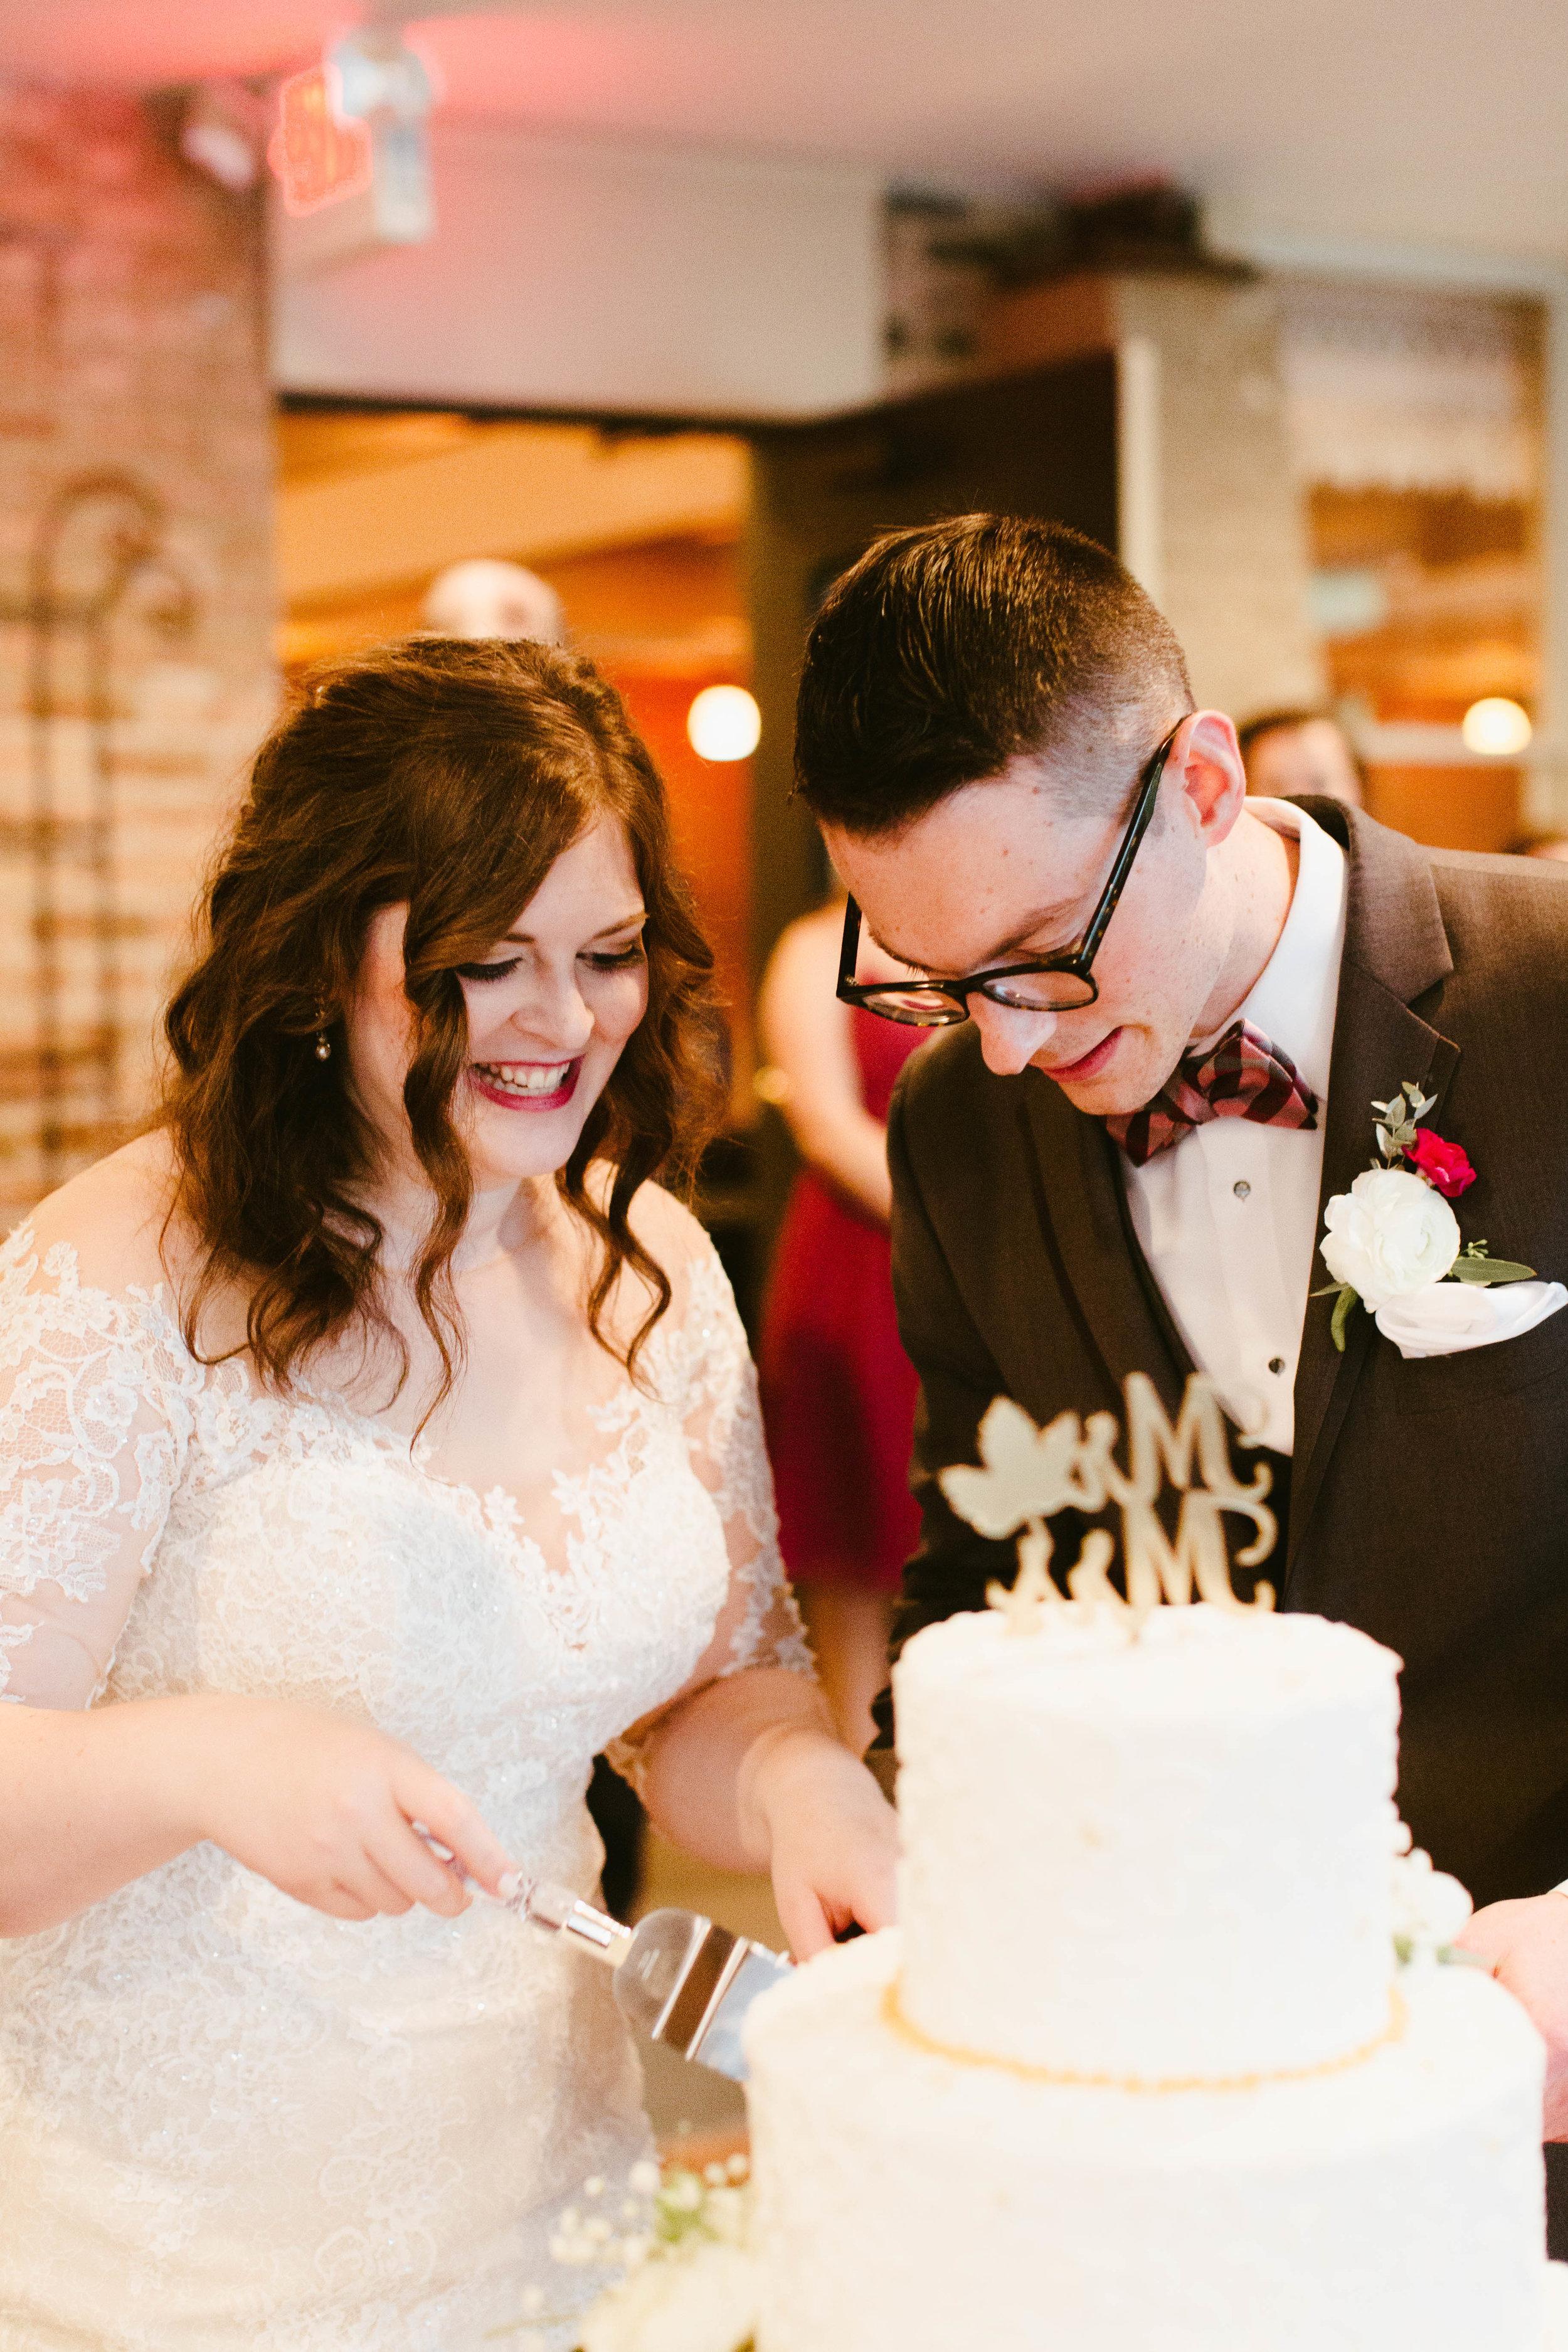 jennahazelphotography-marcy+ben-wedding-0312.jpg